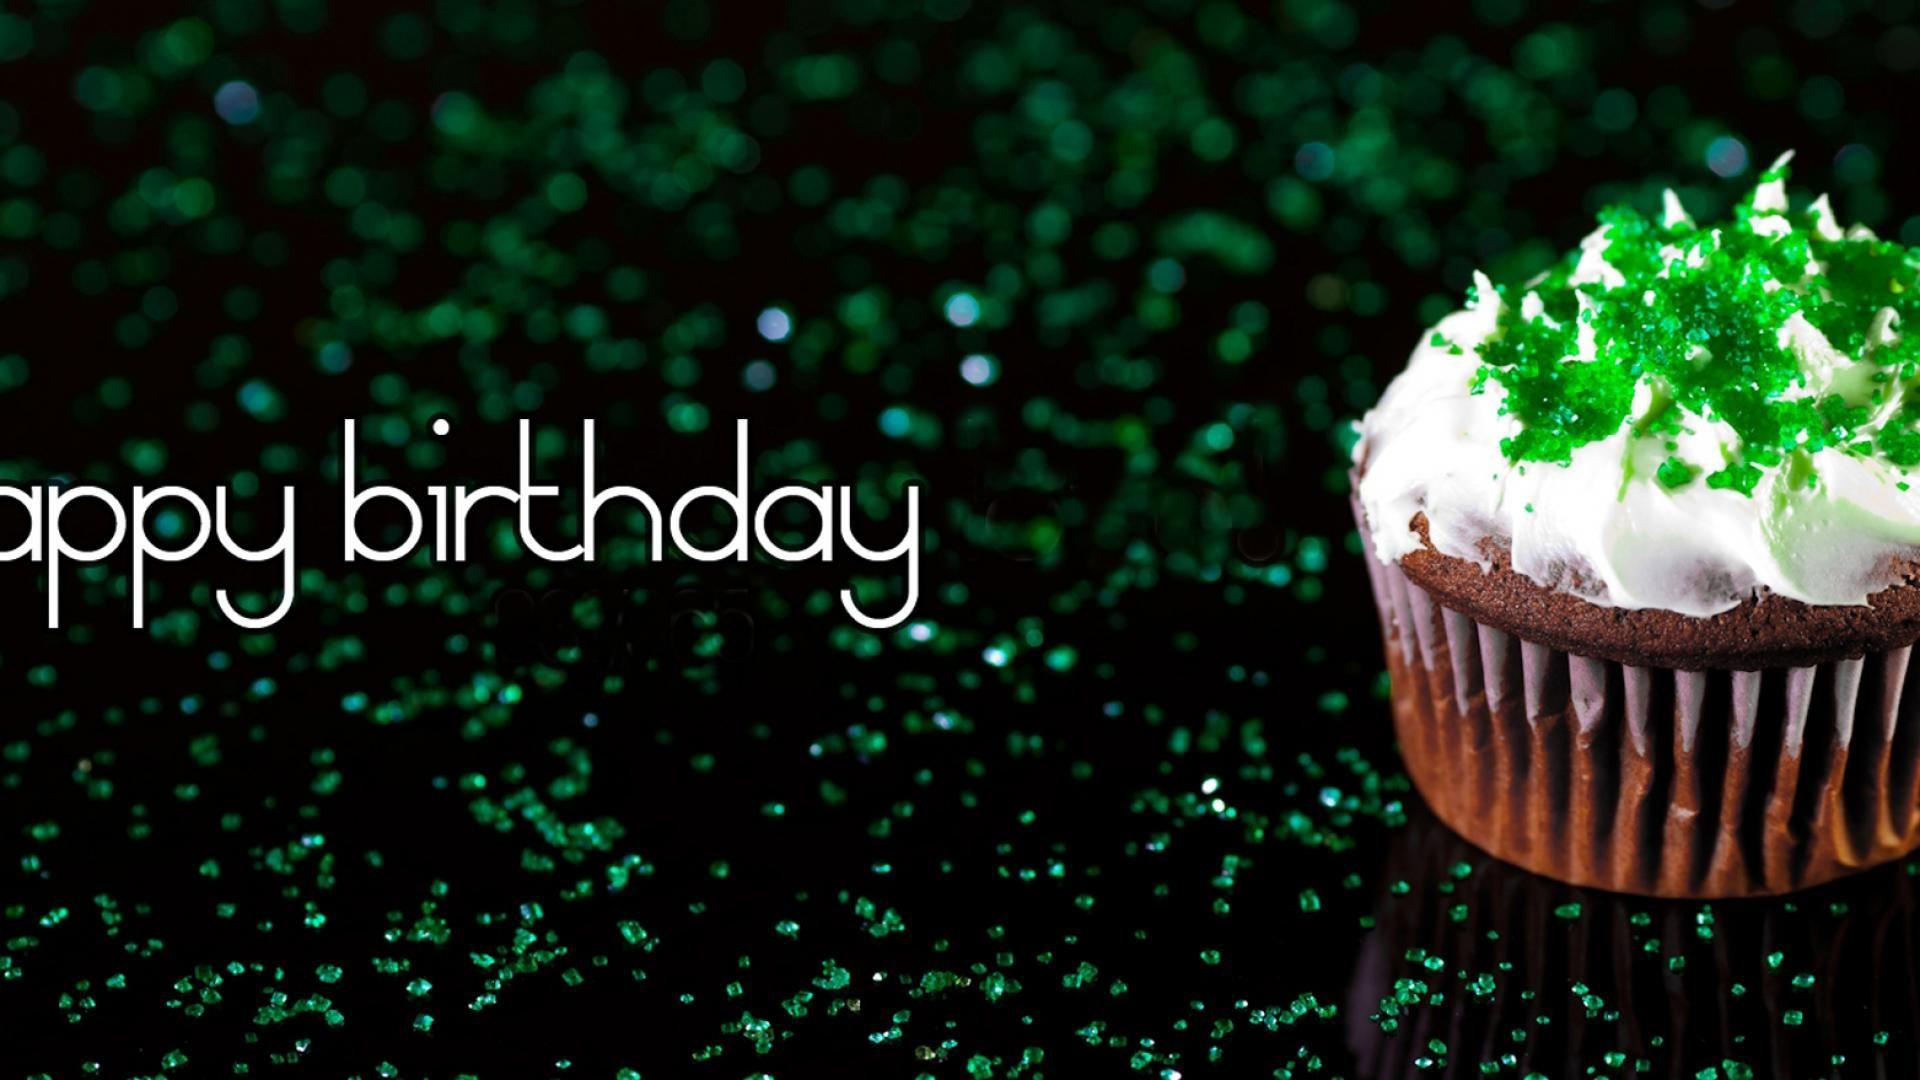 Happy Birthday Wallpaper Birthday Images Pinterest